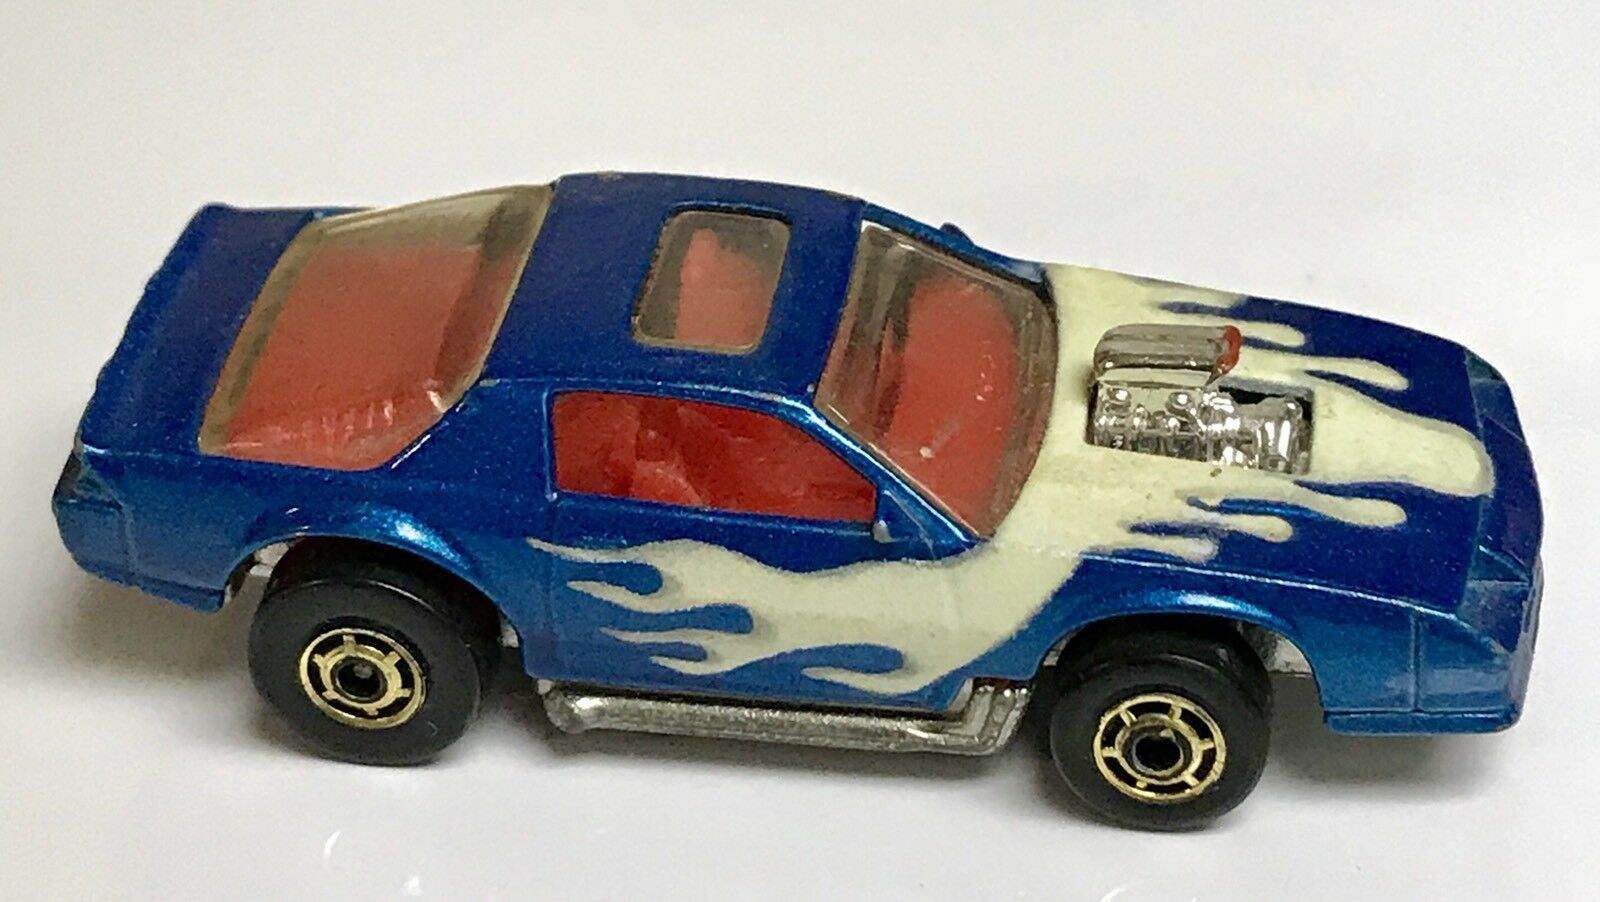 1986 HOT WHEELS TURBOTRAX Turbo Glo Jump Race Set Nº 3243 Mattel BLOWN CAMARO